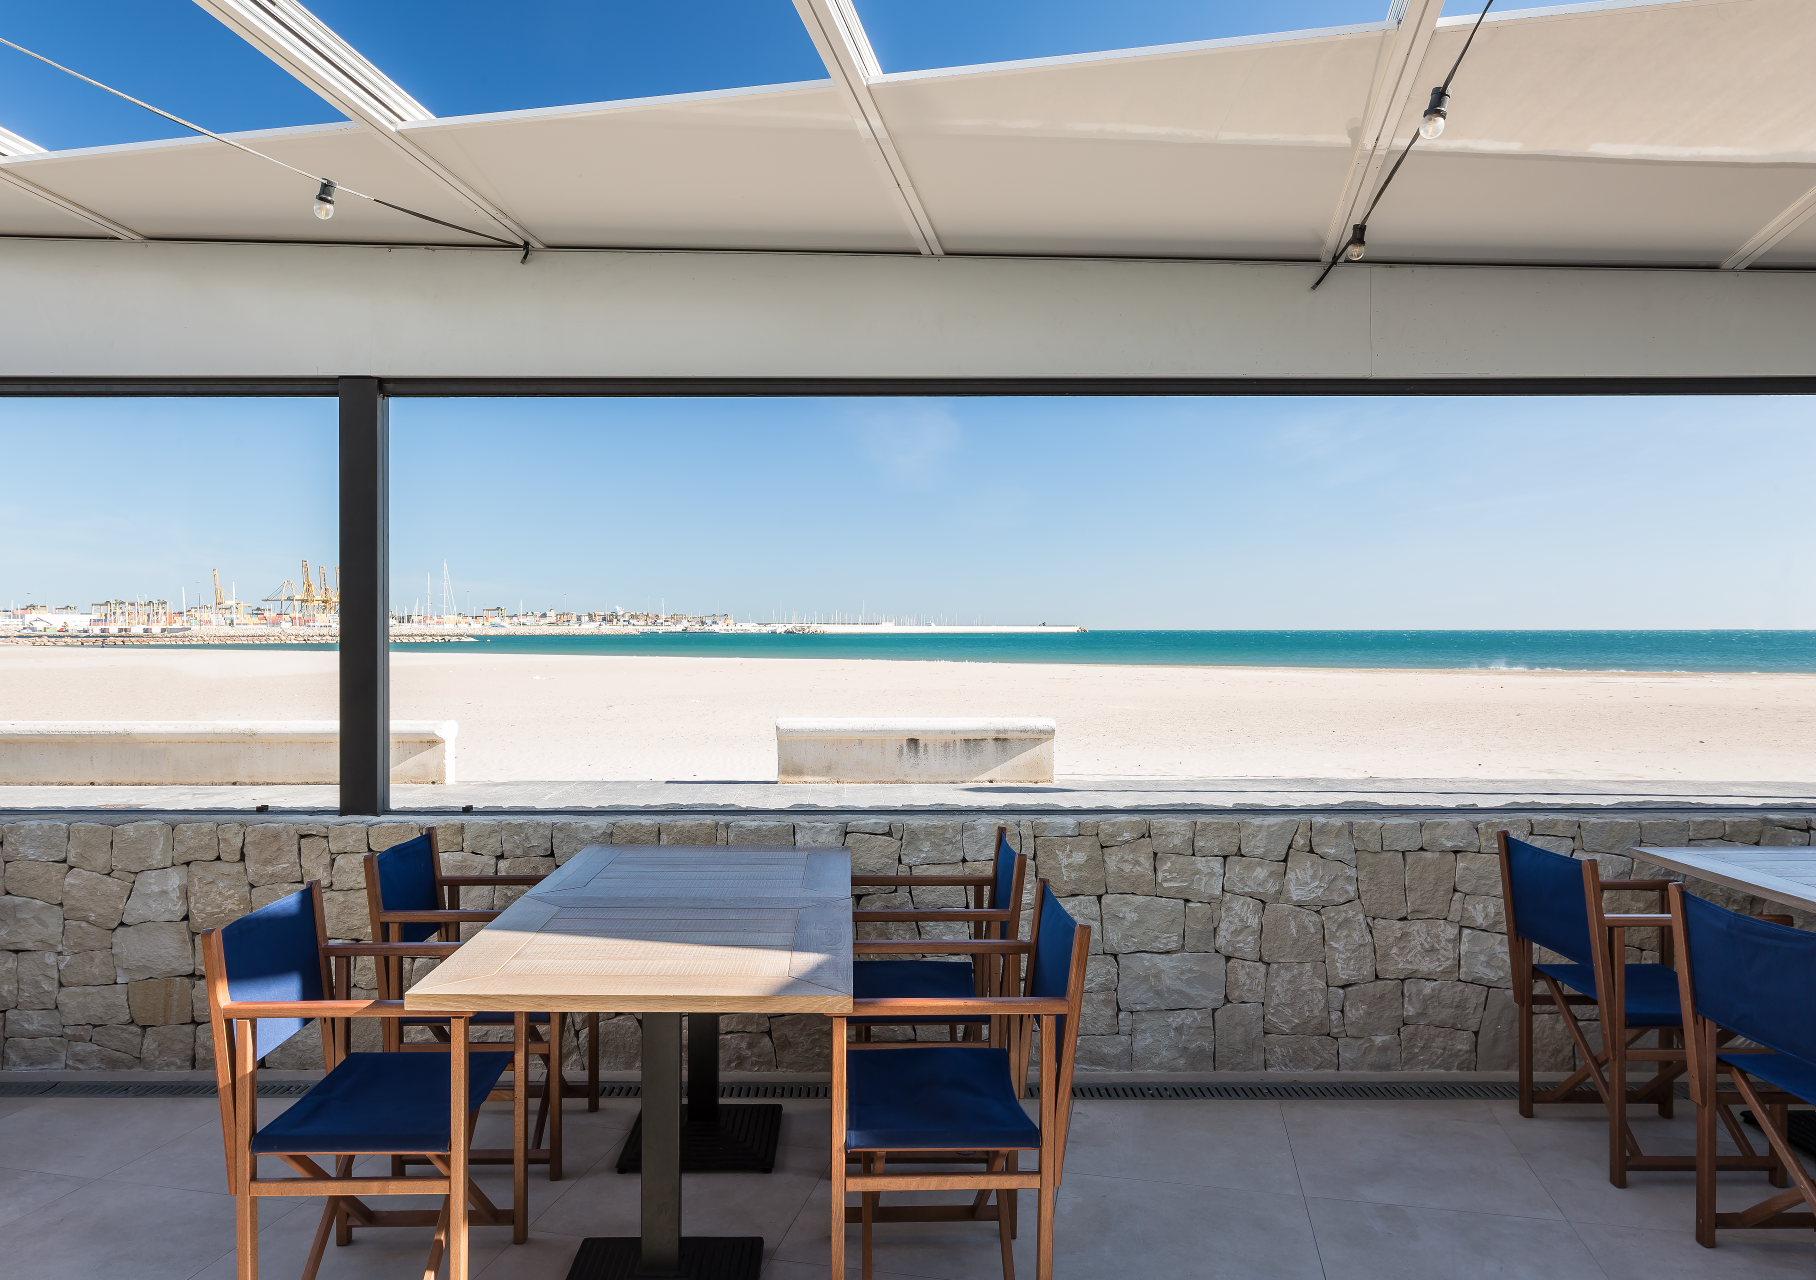 fotografia-arquitectura-valencia-german-cabo-versea-restaurante-ferrera-pinedo (7)